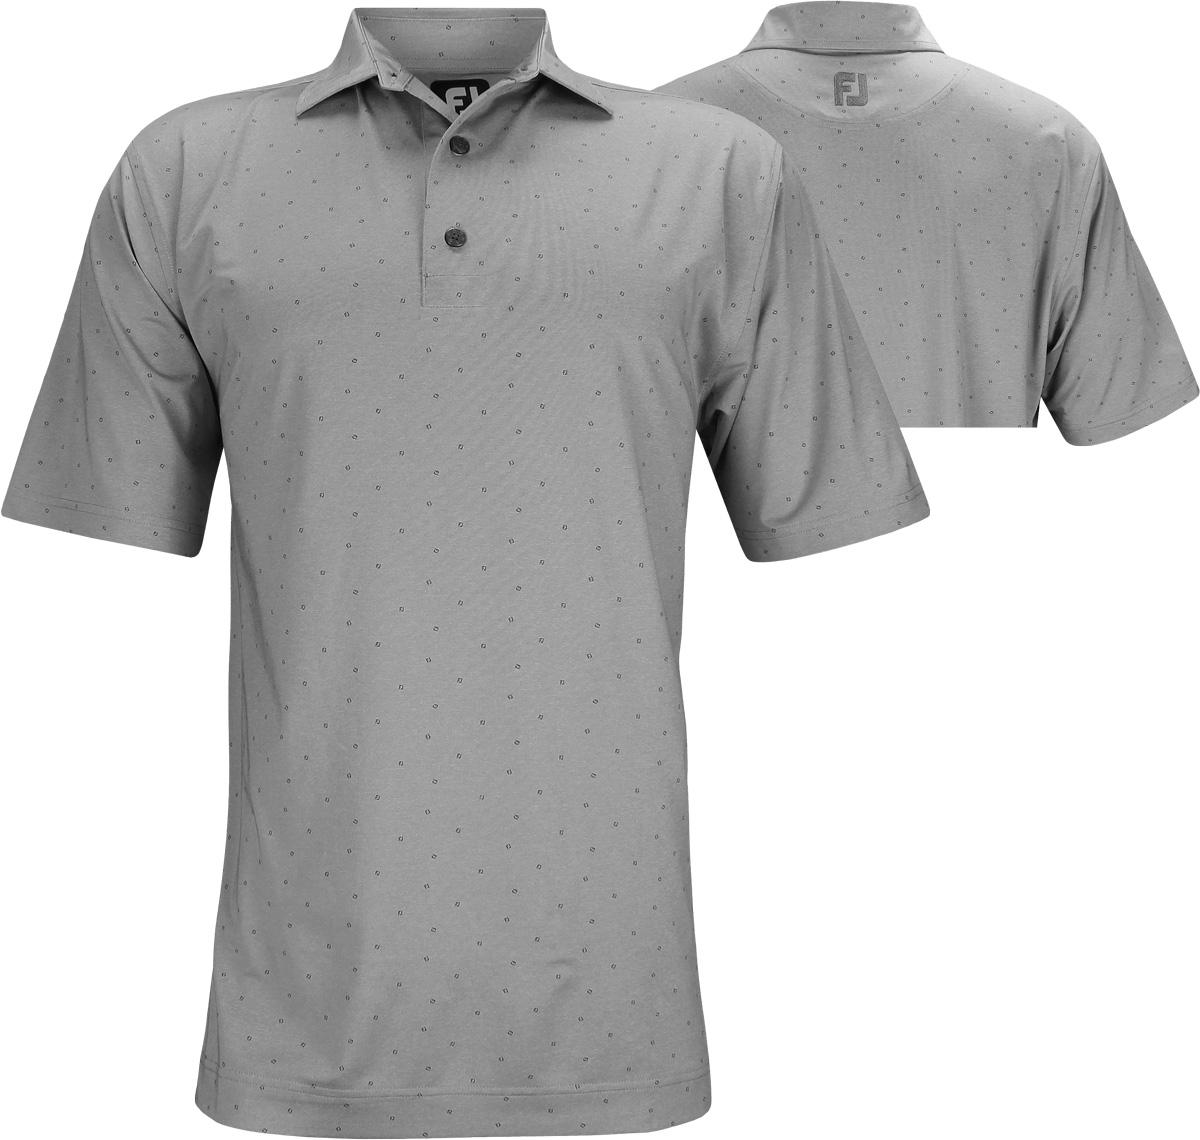 Footjoy Lisle Fj Print Golf Shirts